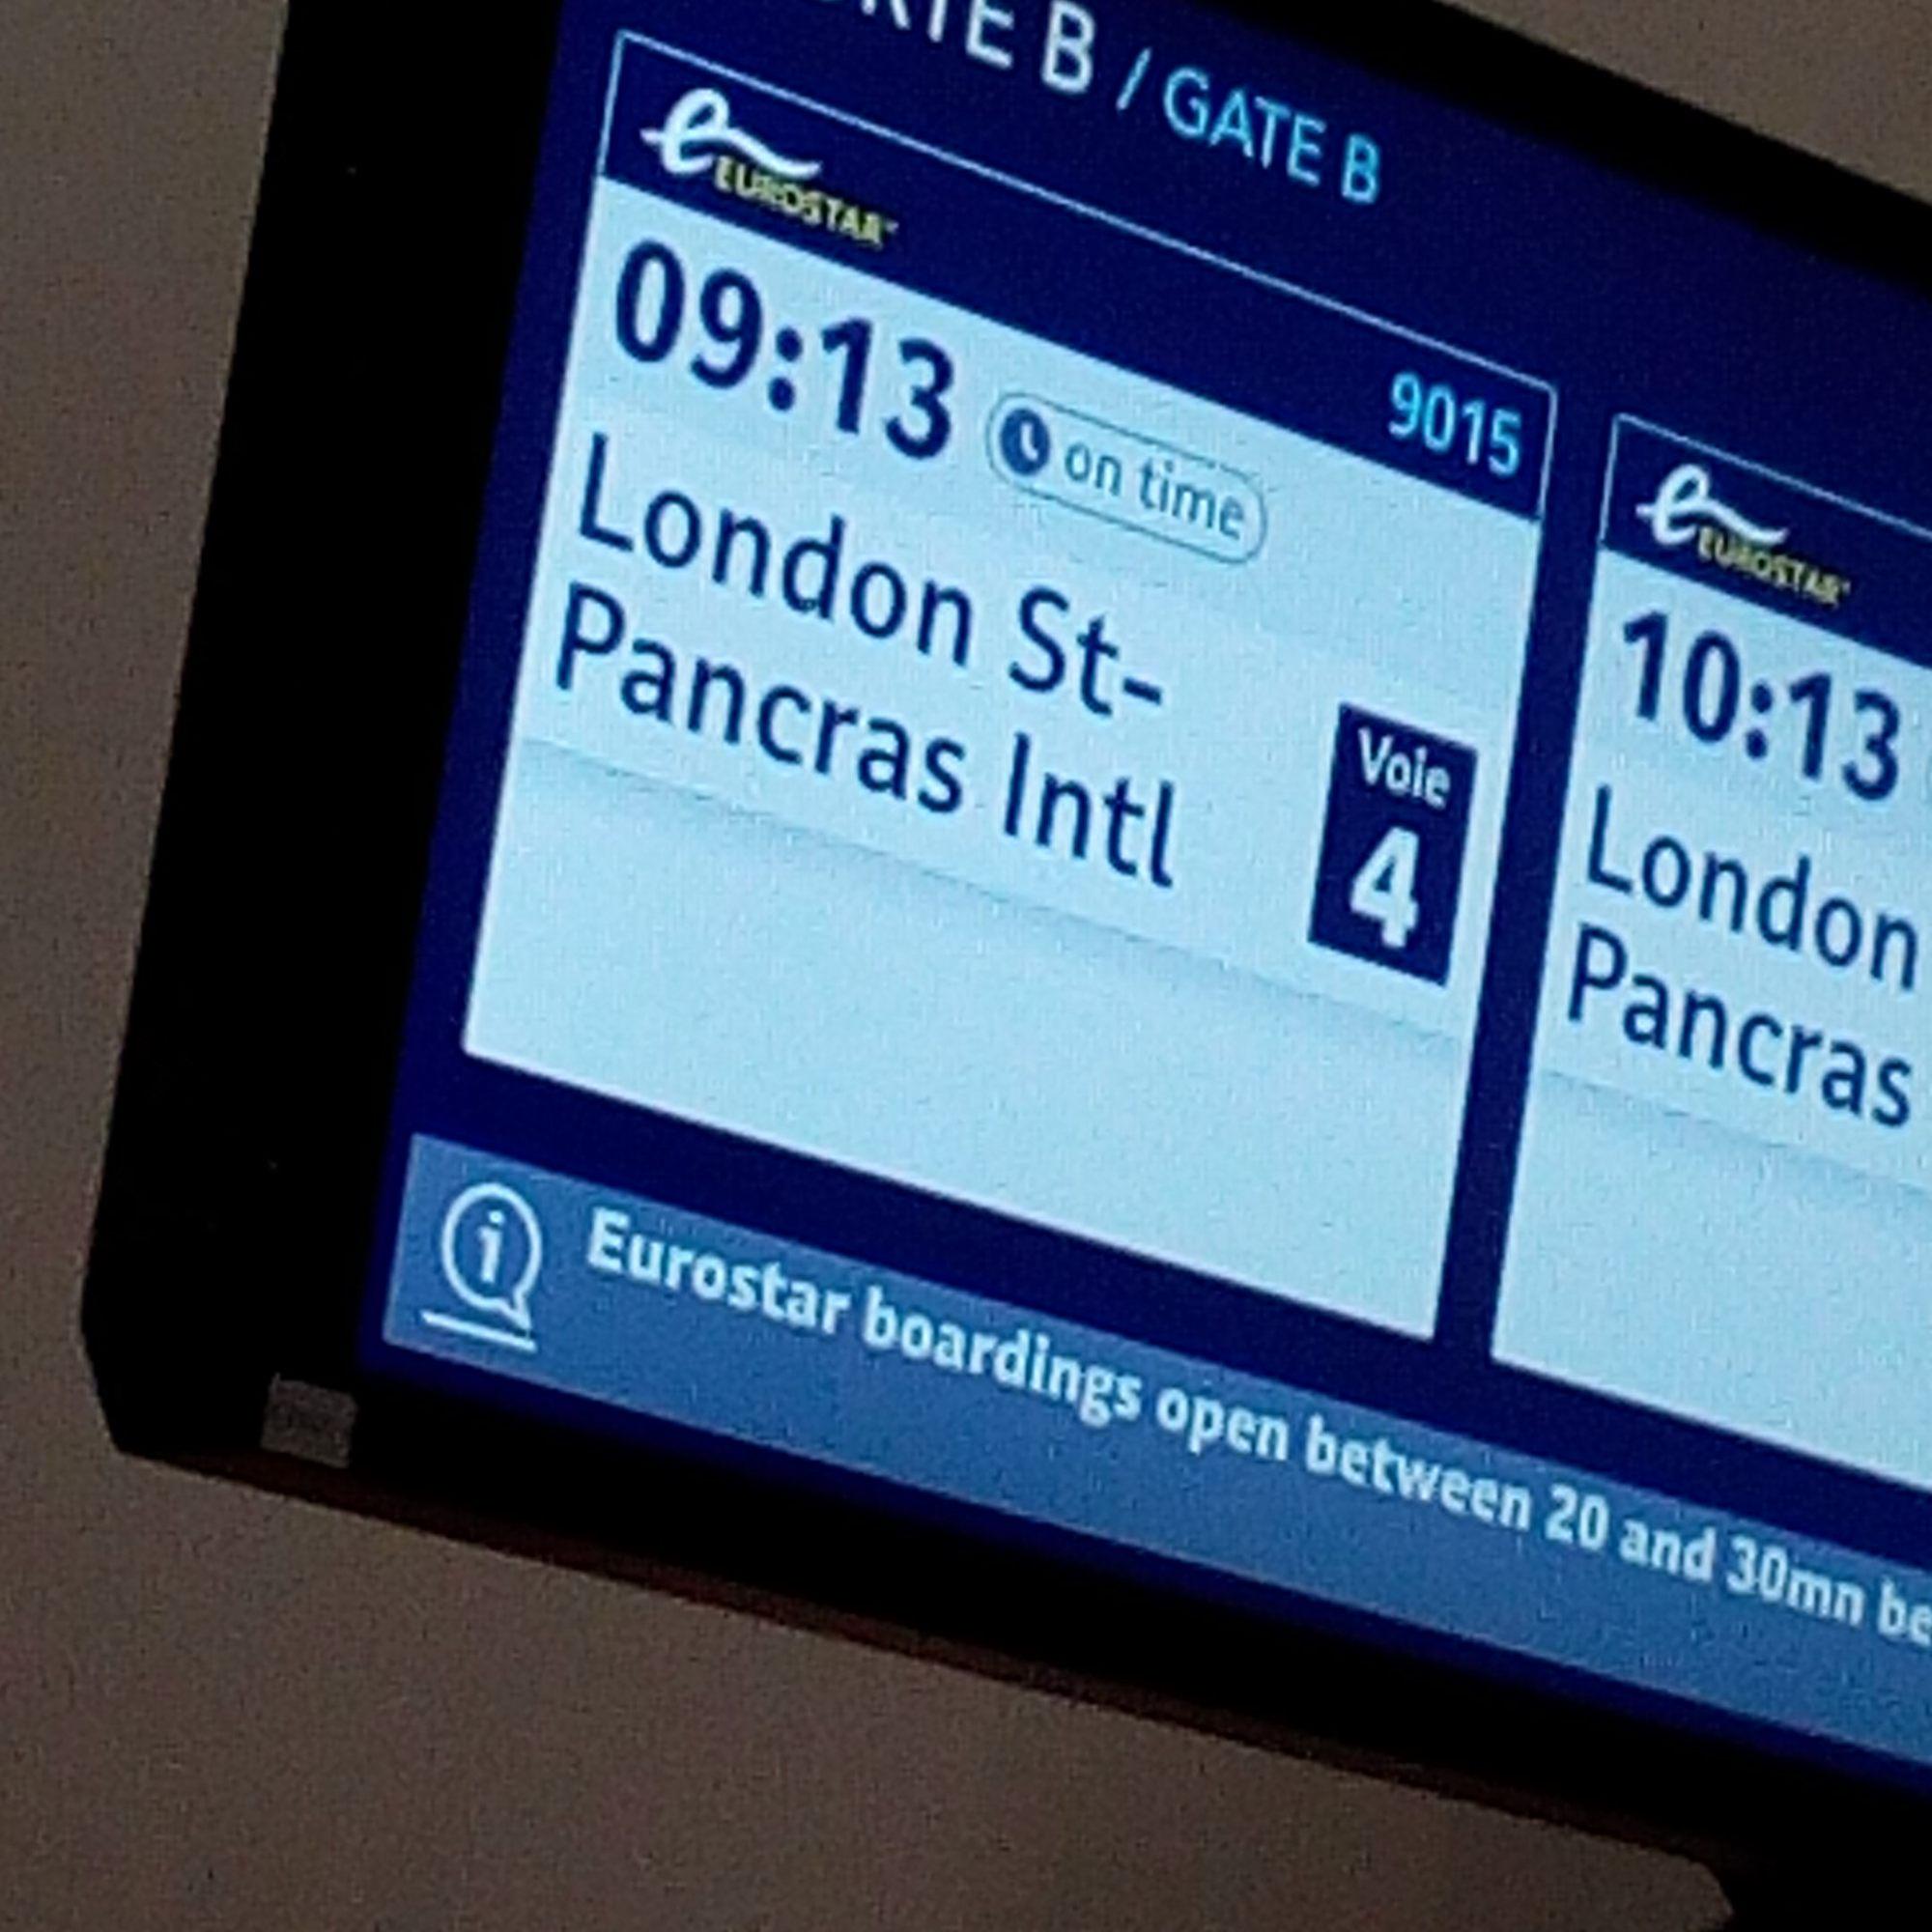 Londres, Eurostar et Saint Pancras